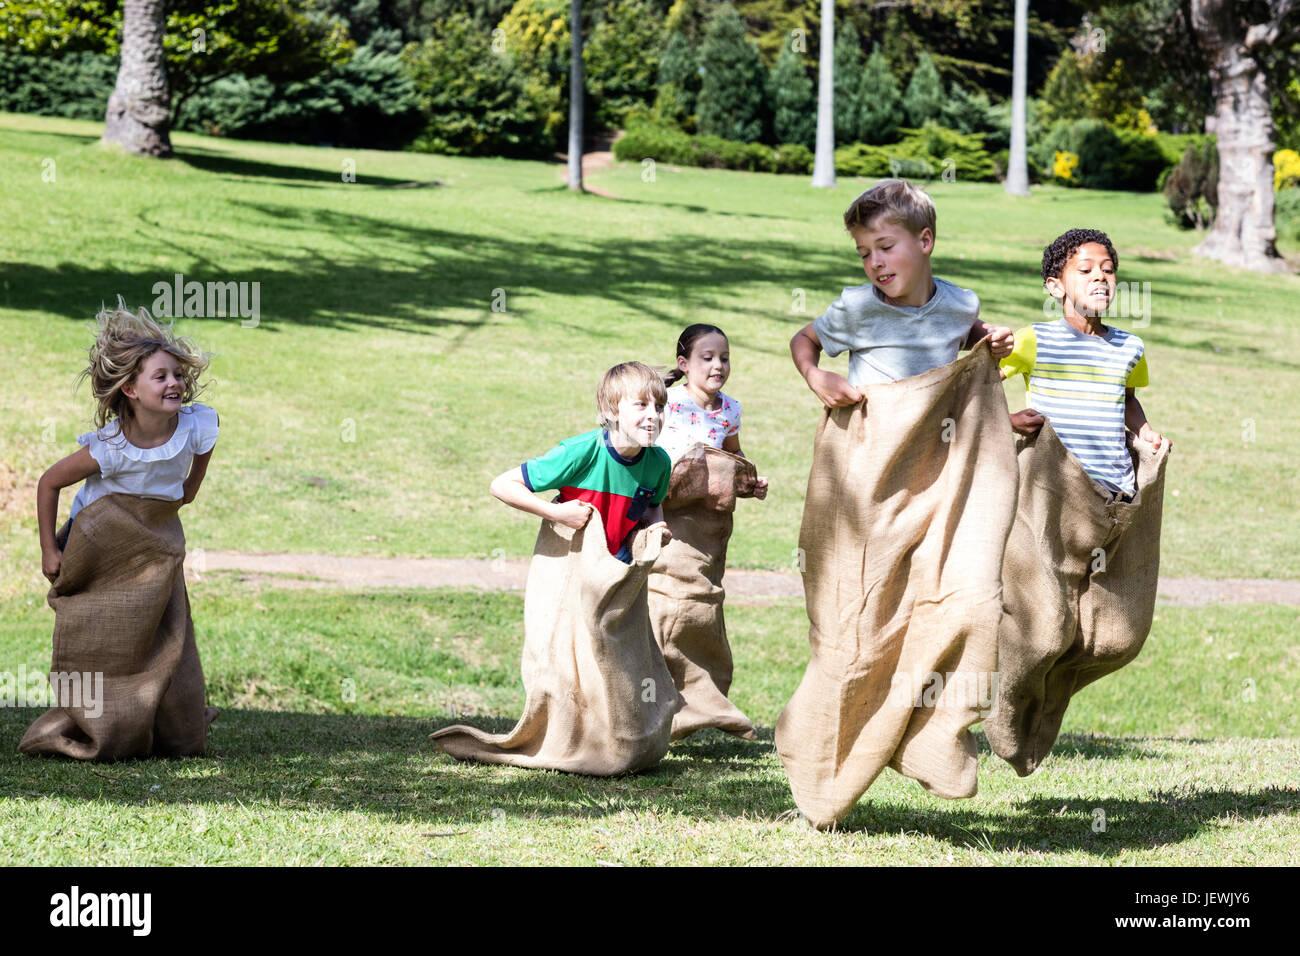 Children having a sack race in park - Stock Image